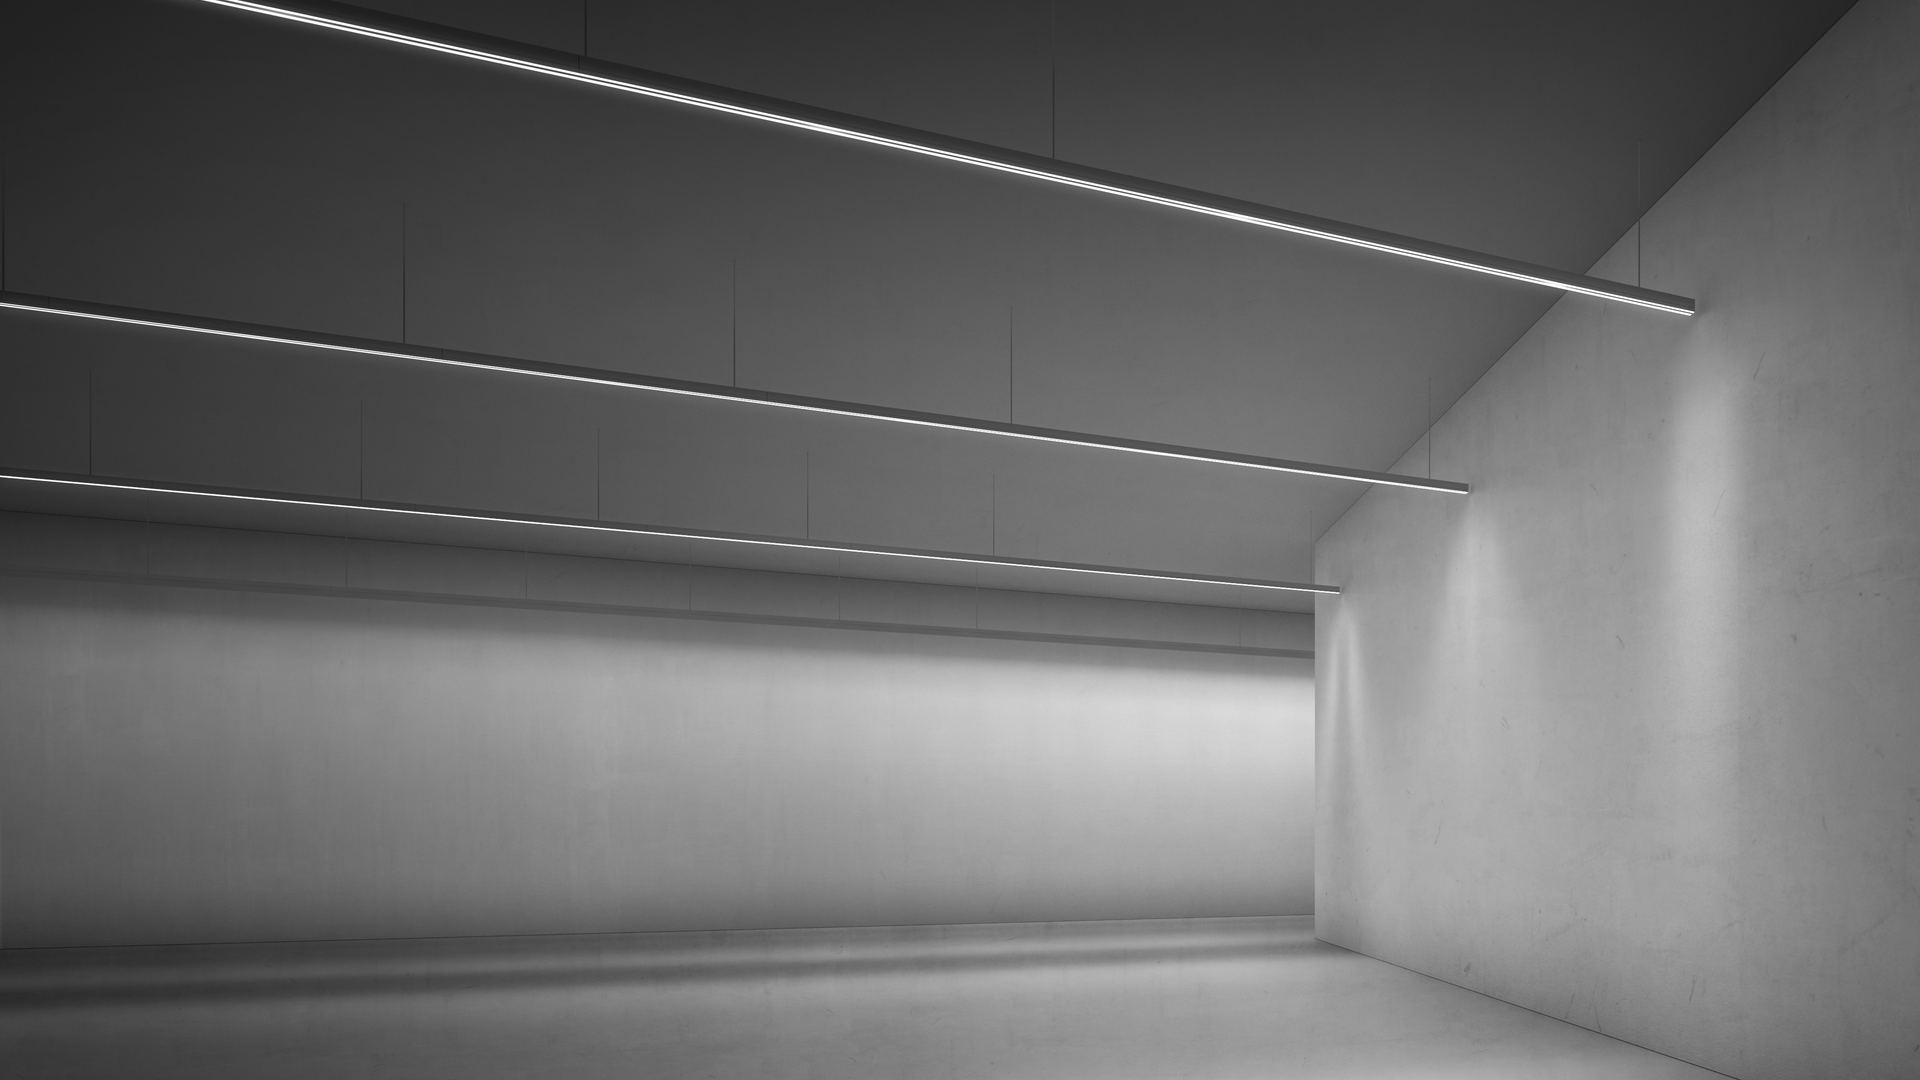 tecton led linear versatile and efficient lighting. Black Bedroom Furniture Sets. Home Design Ideas